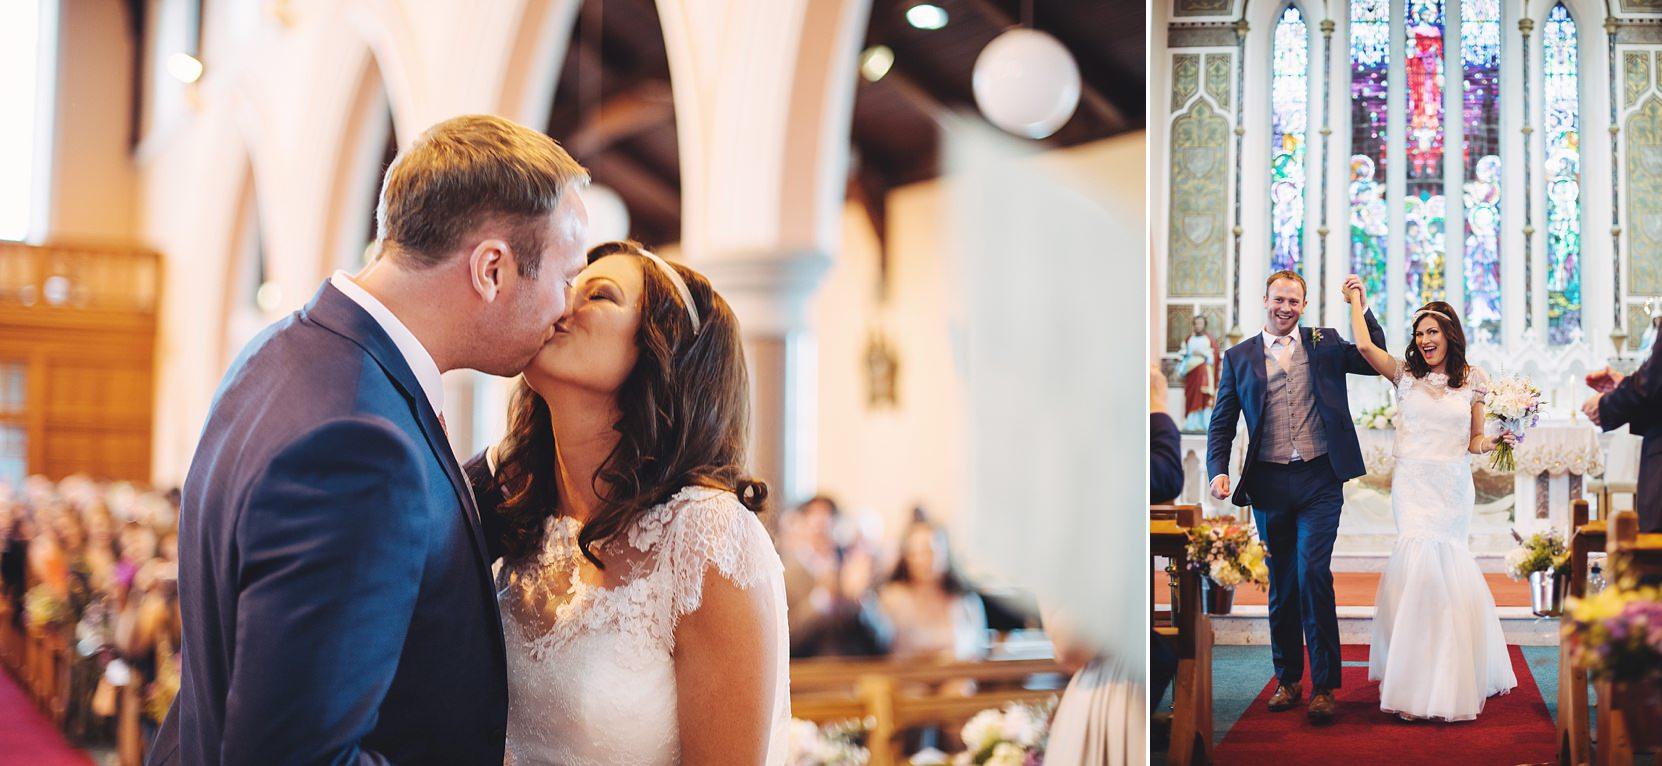 Cloughjordan-Wedding-Photography_0083